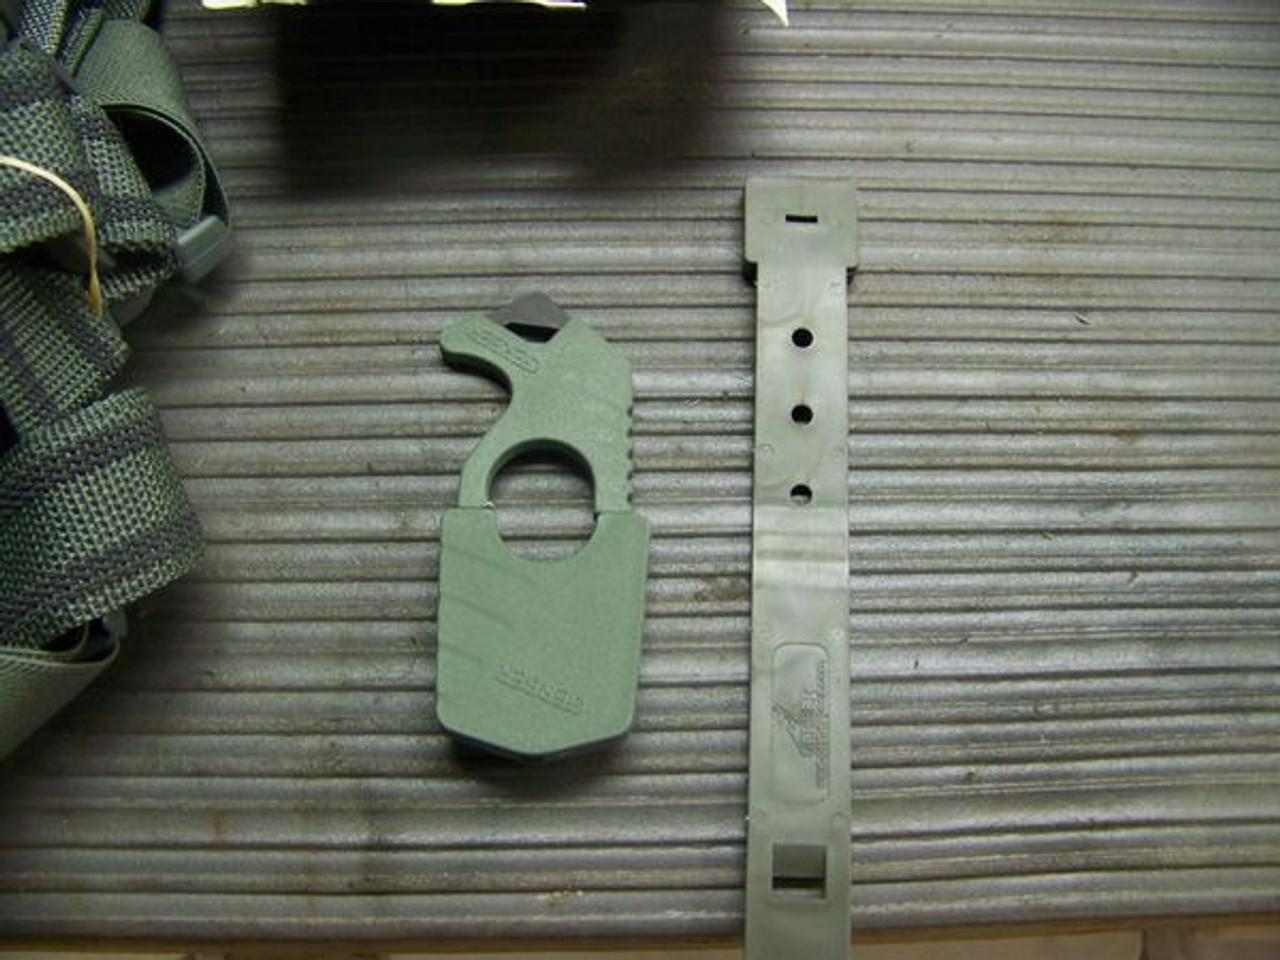 Gerber LMF II ASEK - FG504 Green, IR